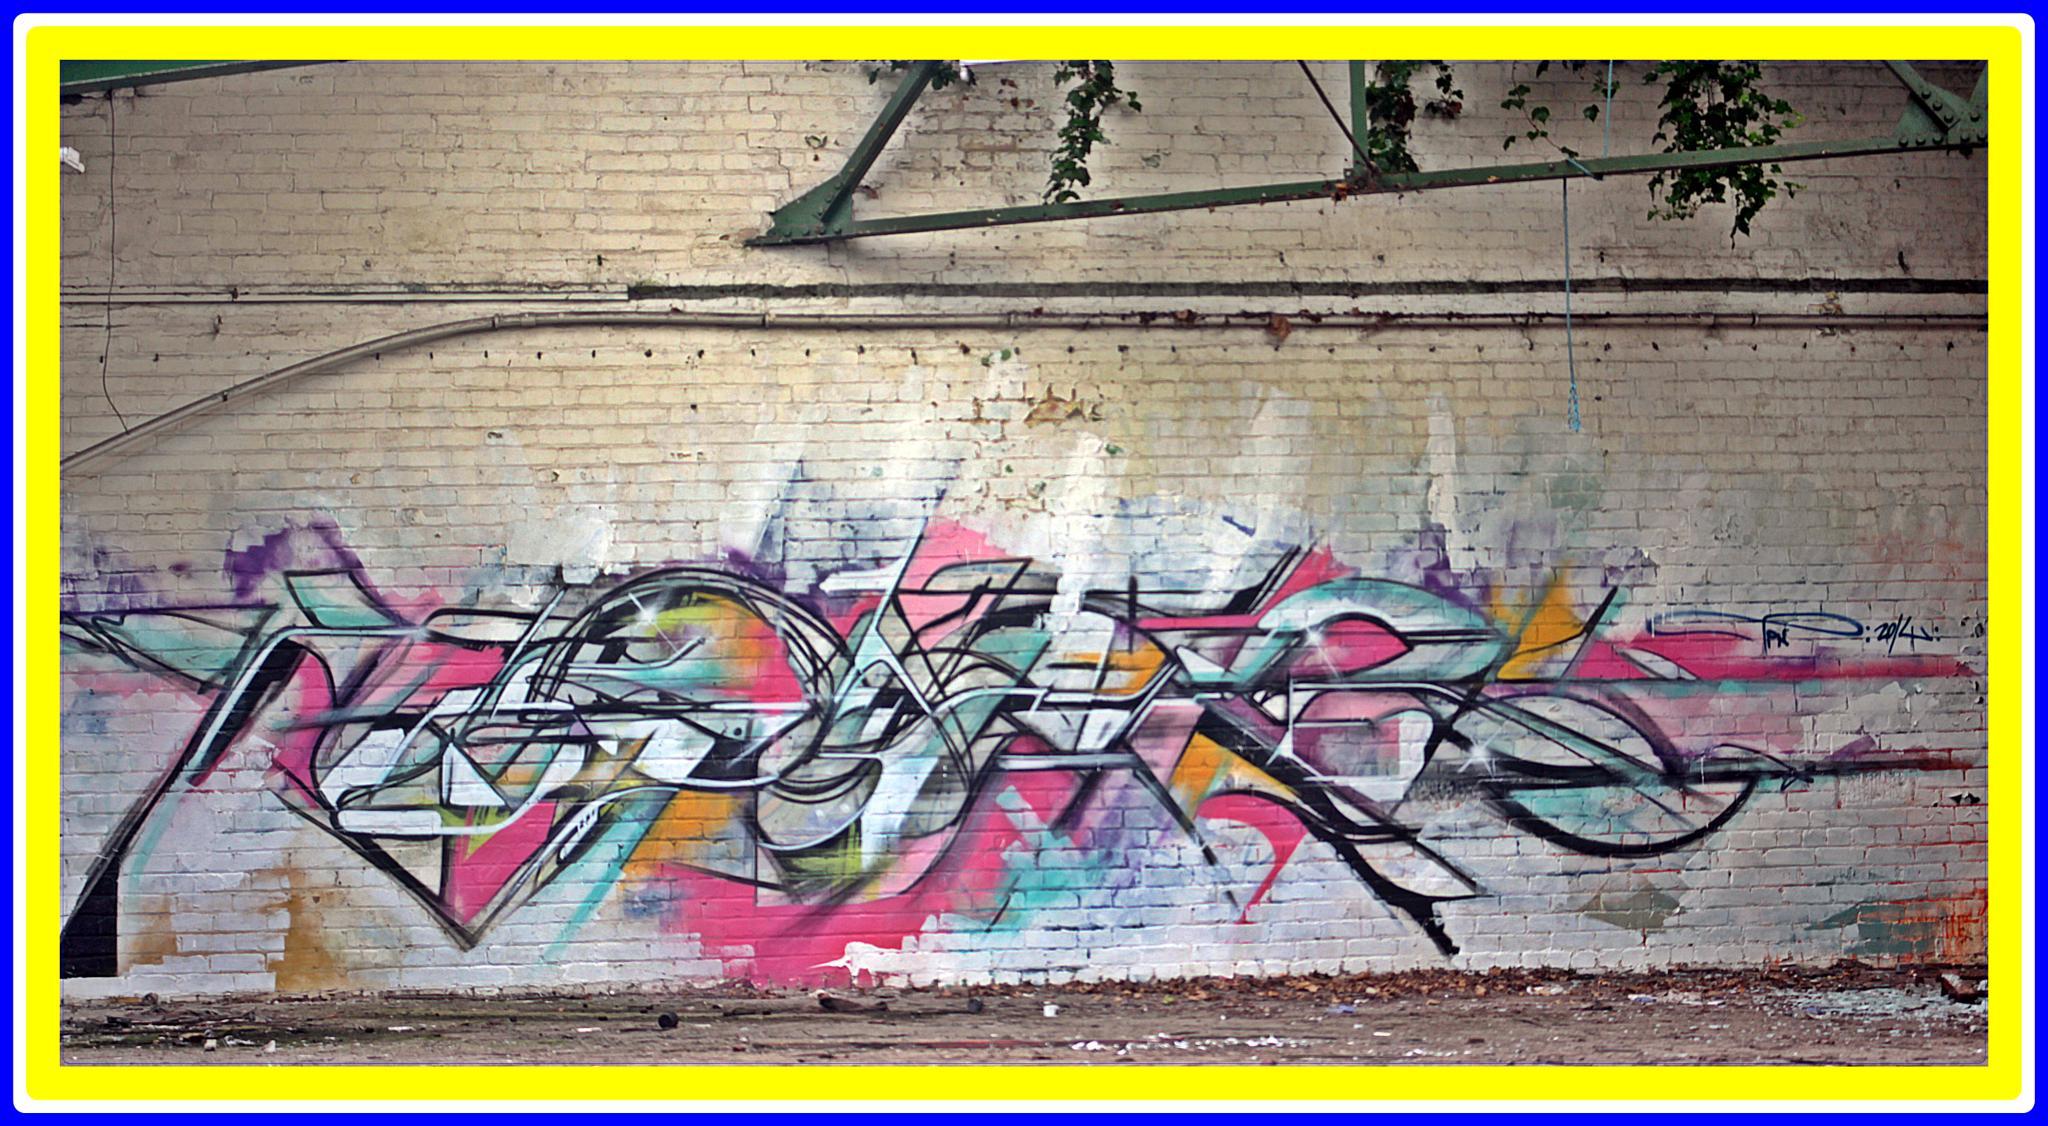 graffiti by gavin holloway